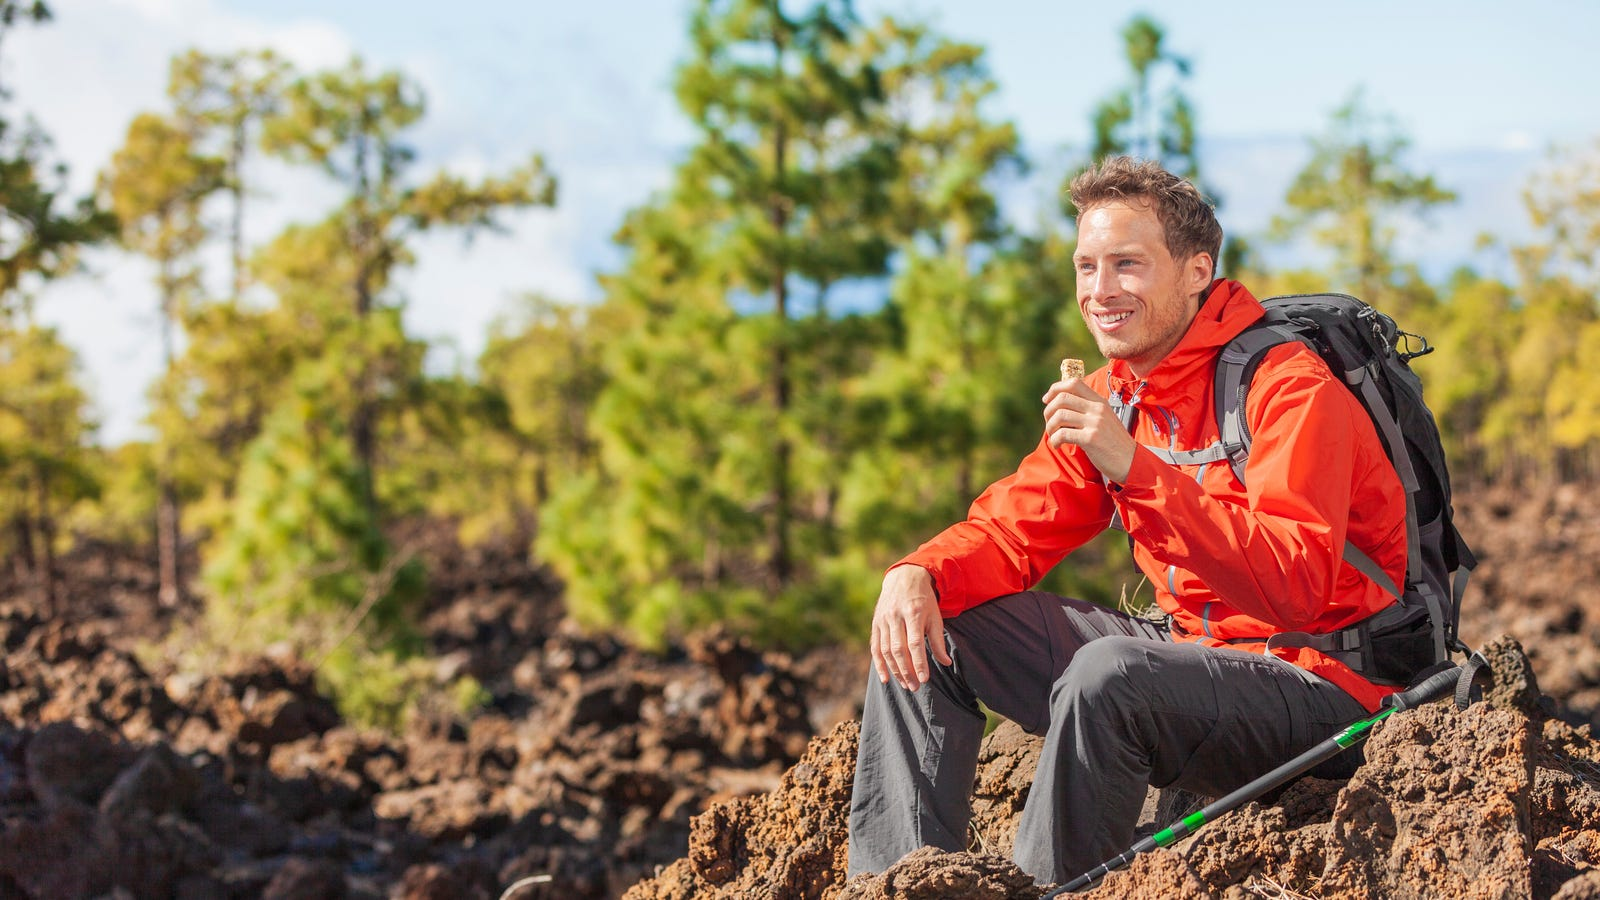 A hiker sitting down taking a break while enjoying a granola bar.